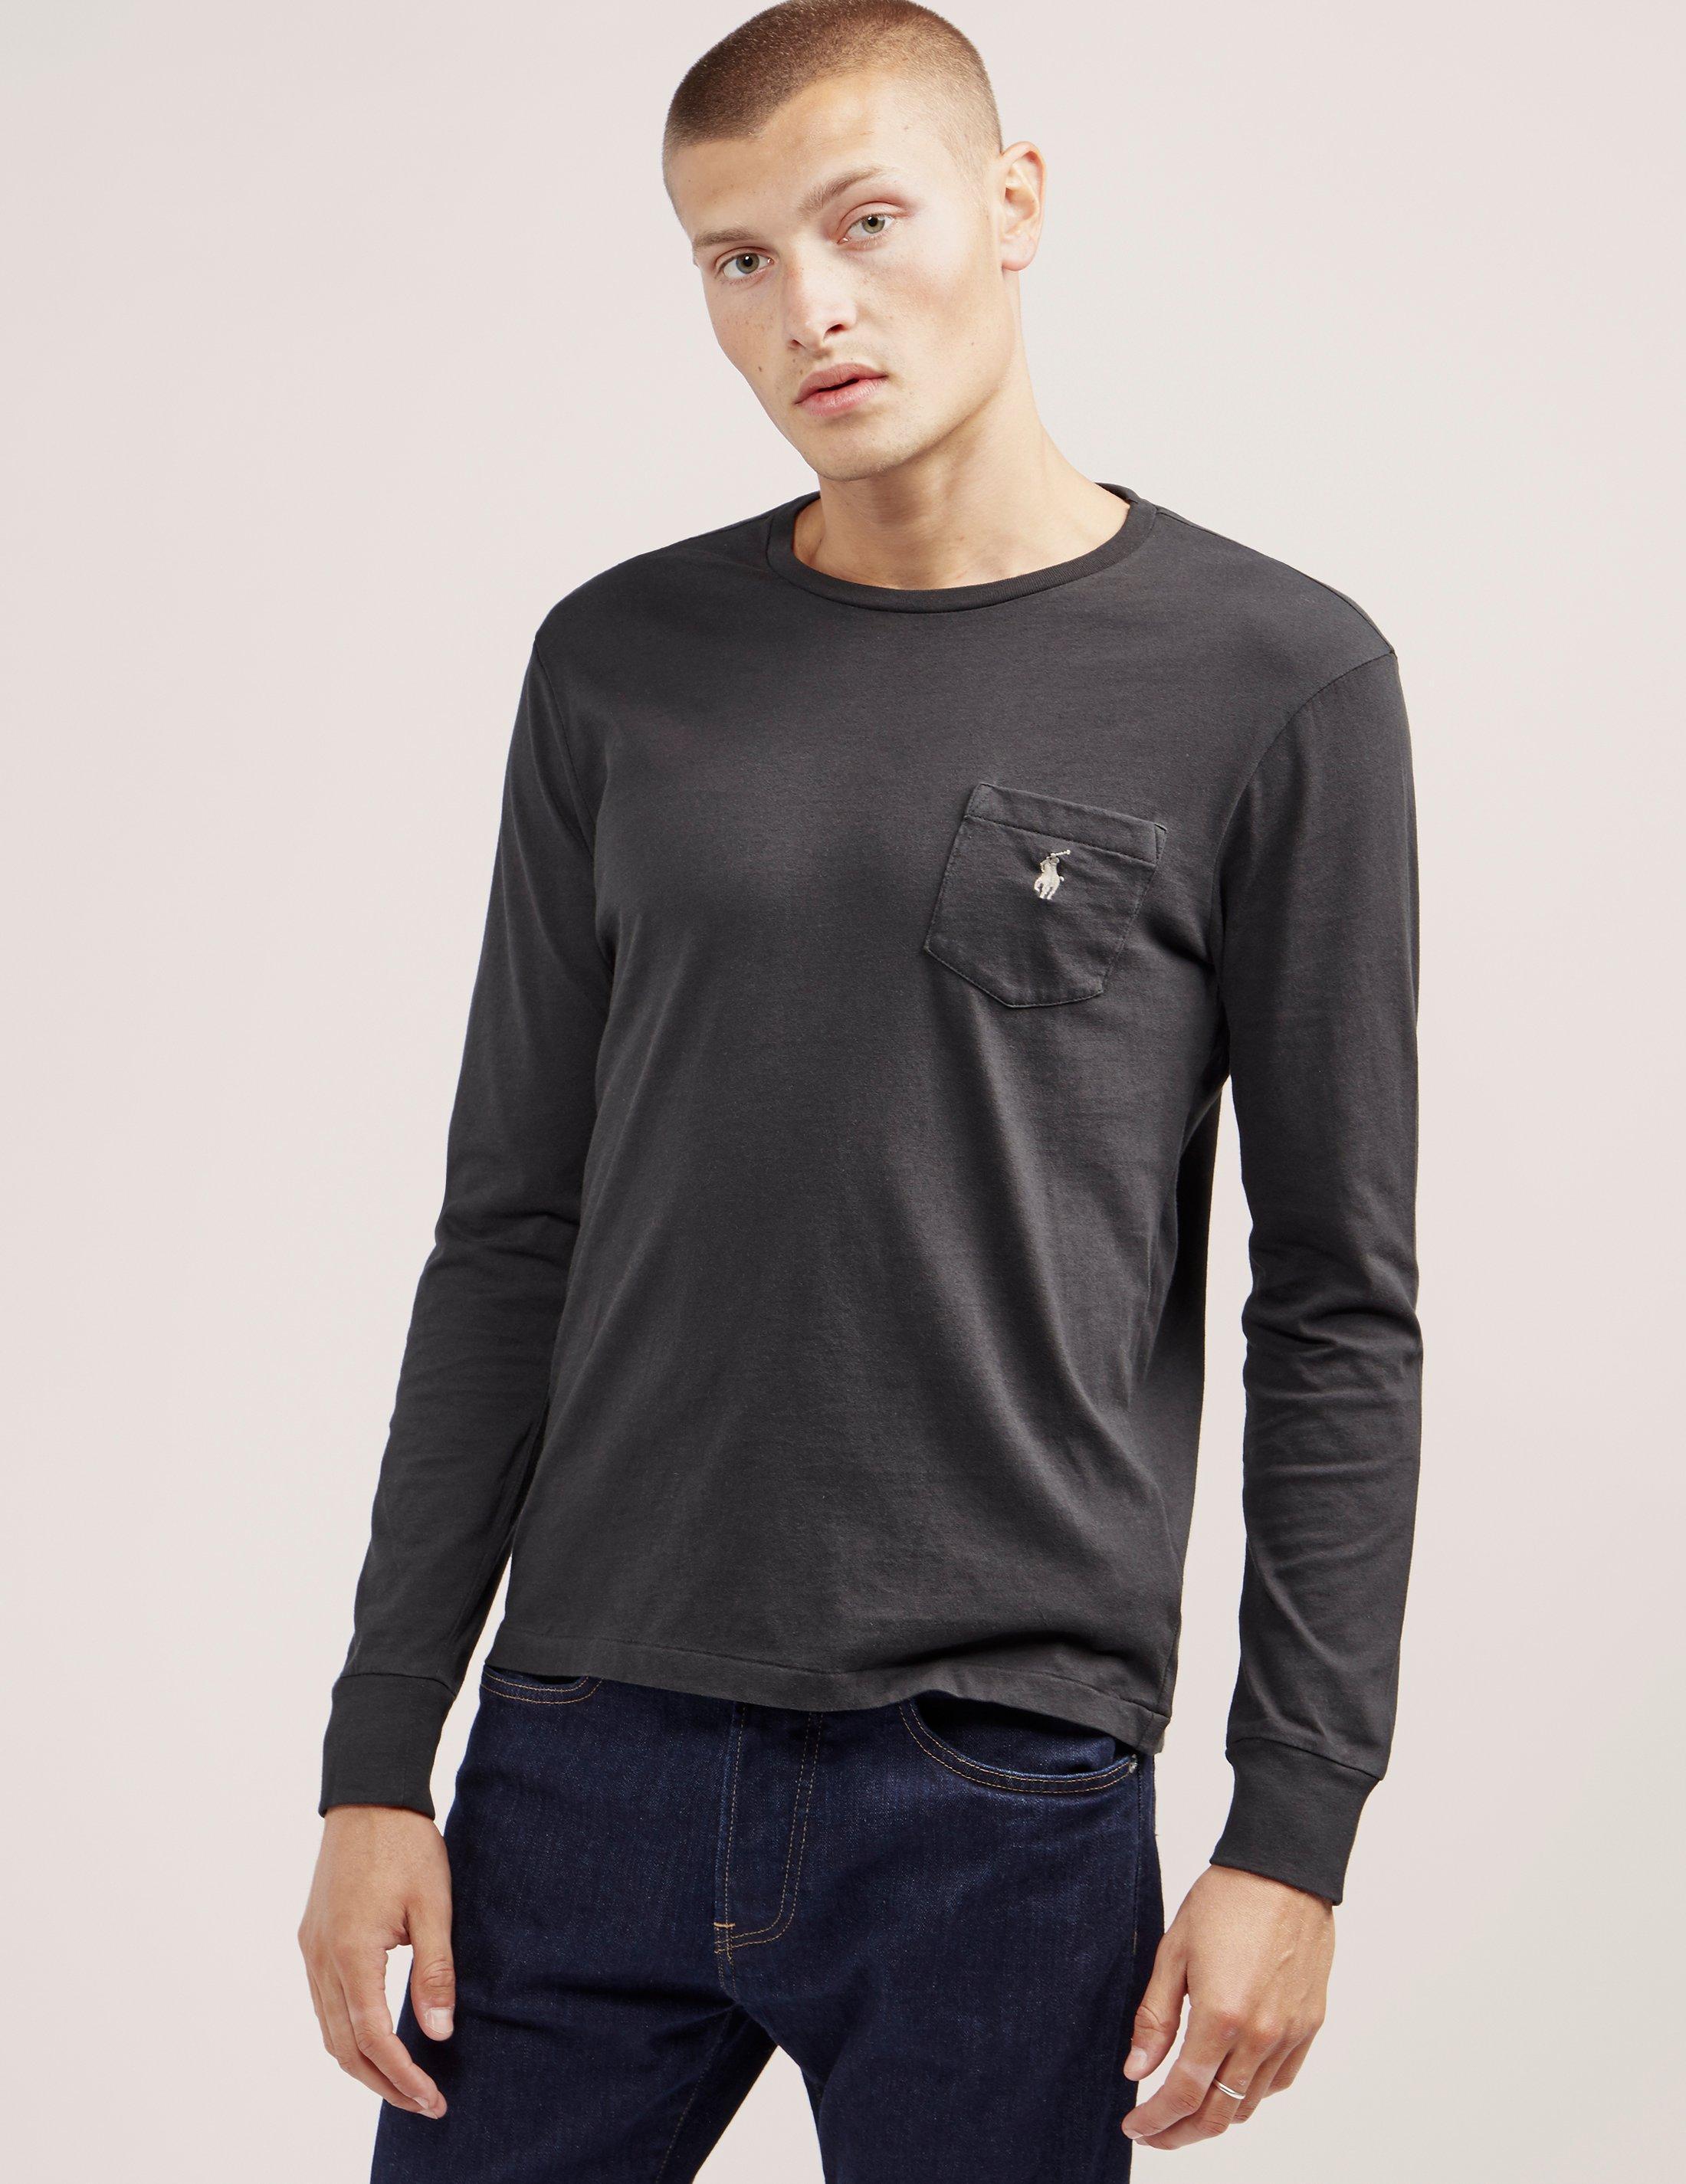 Lyst polo ralph lauren long sleeve pocket t shirt in for Long sleeve pocket shirts